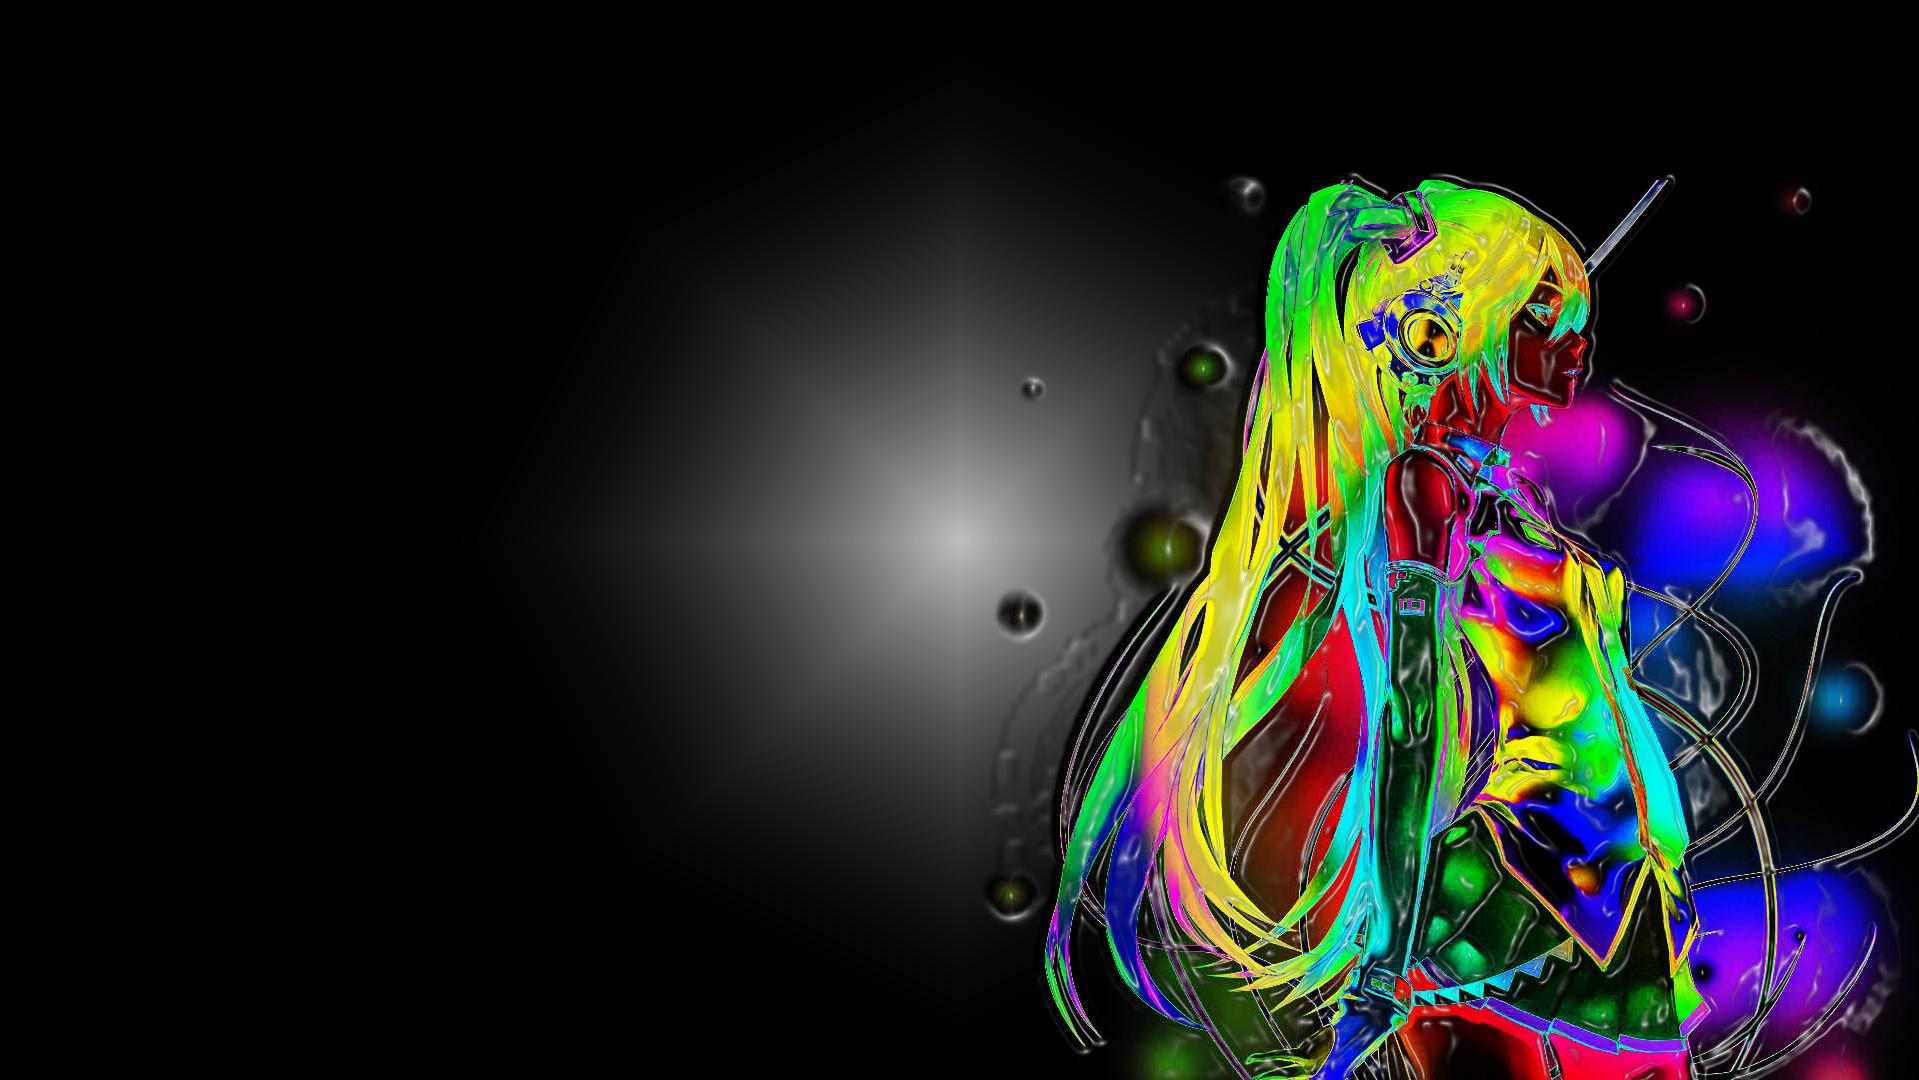 Anime Neon In 3d Duvarkağıdı And Arka Plan 1919x1080 Id400677